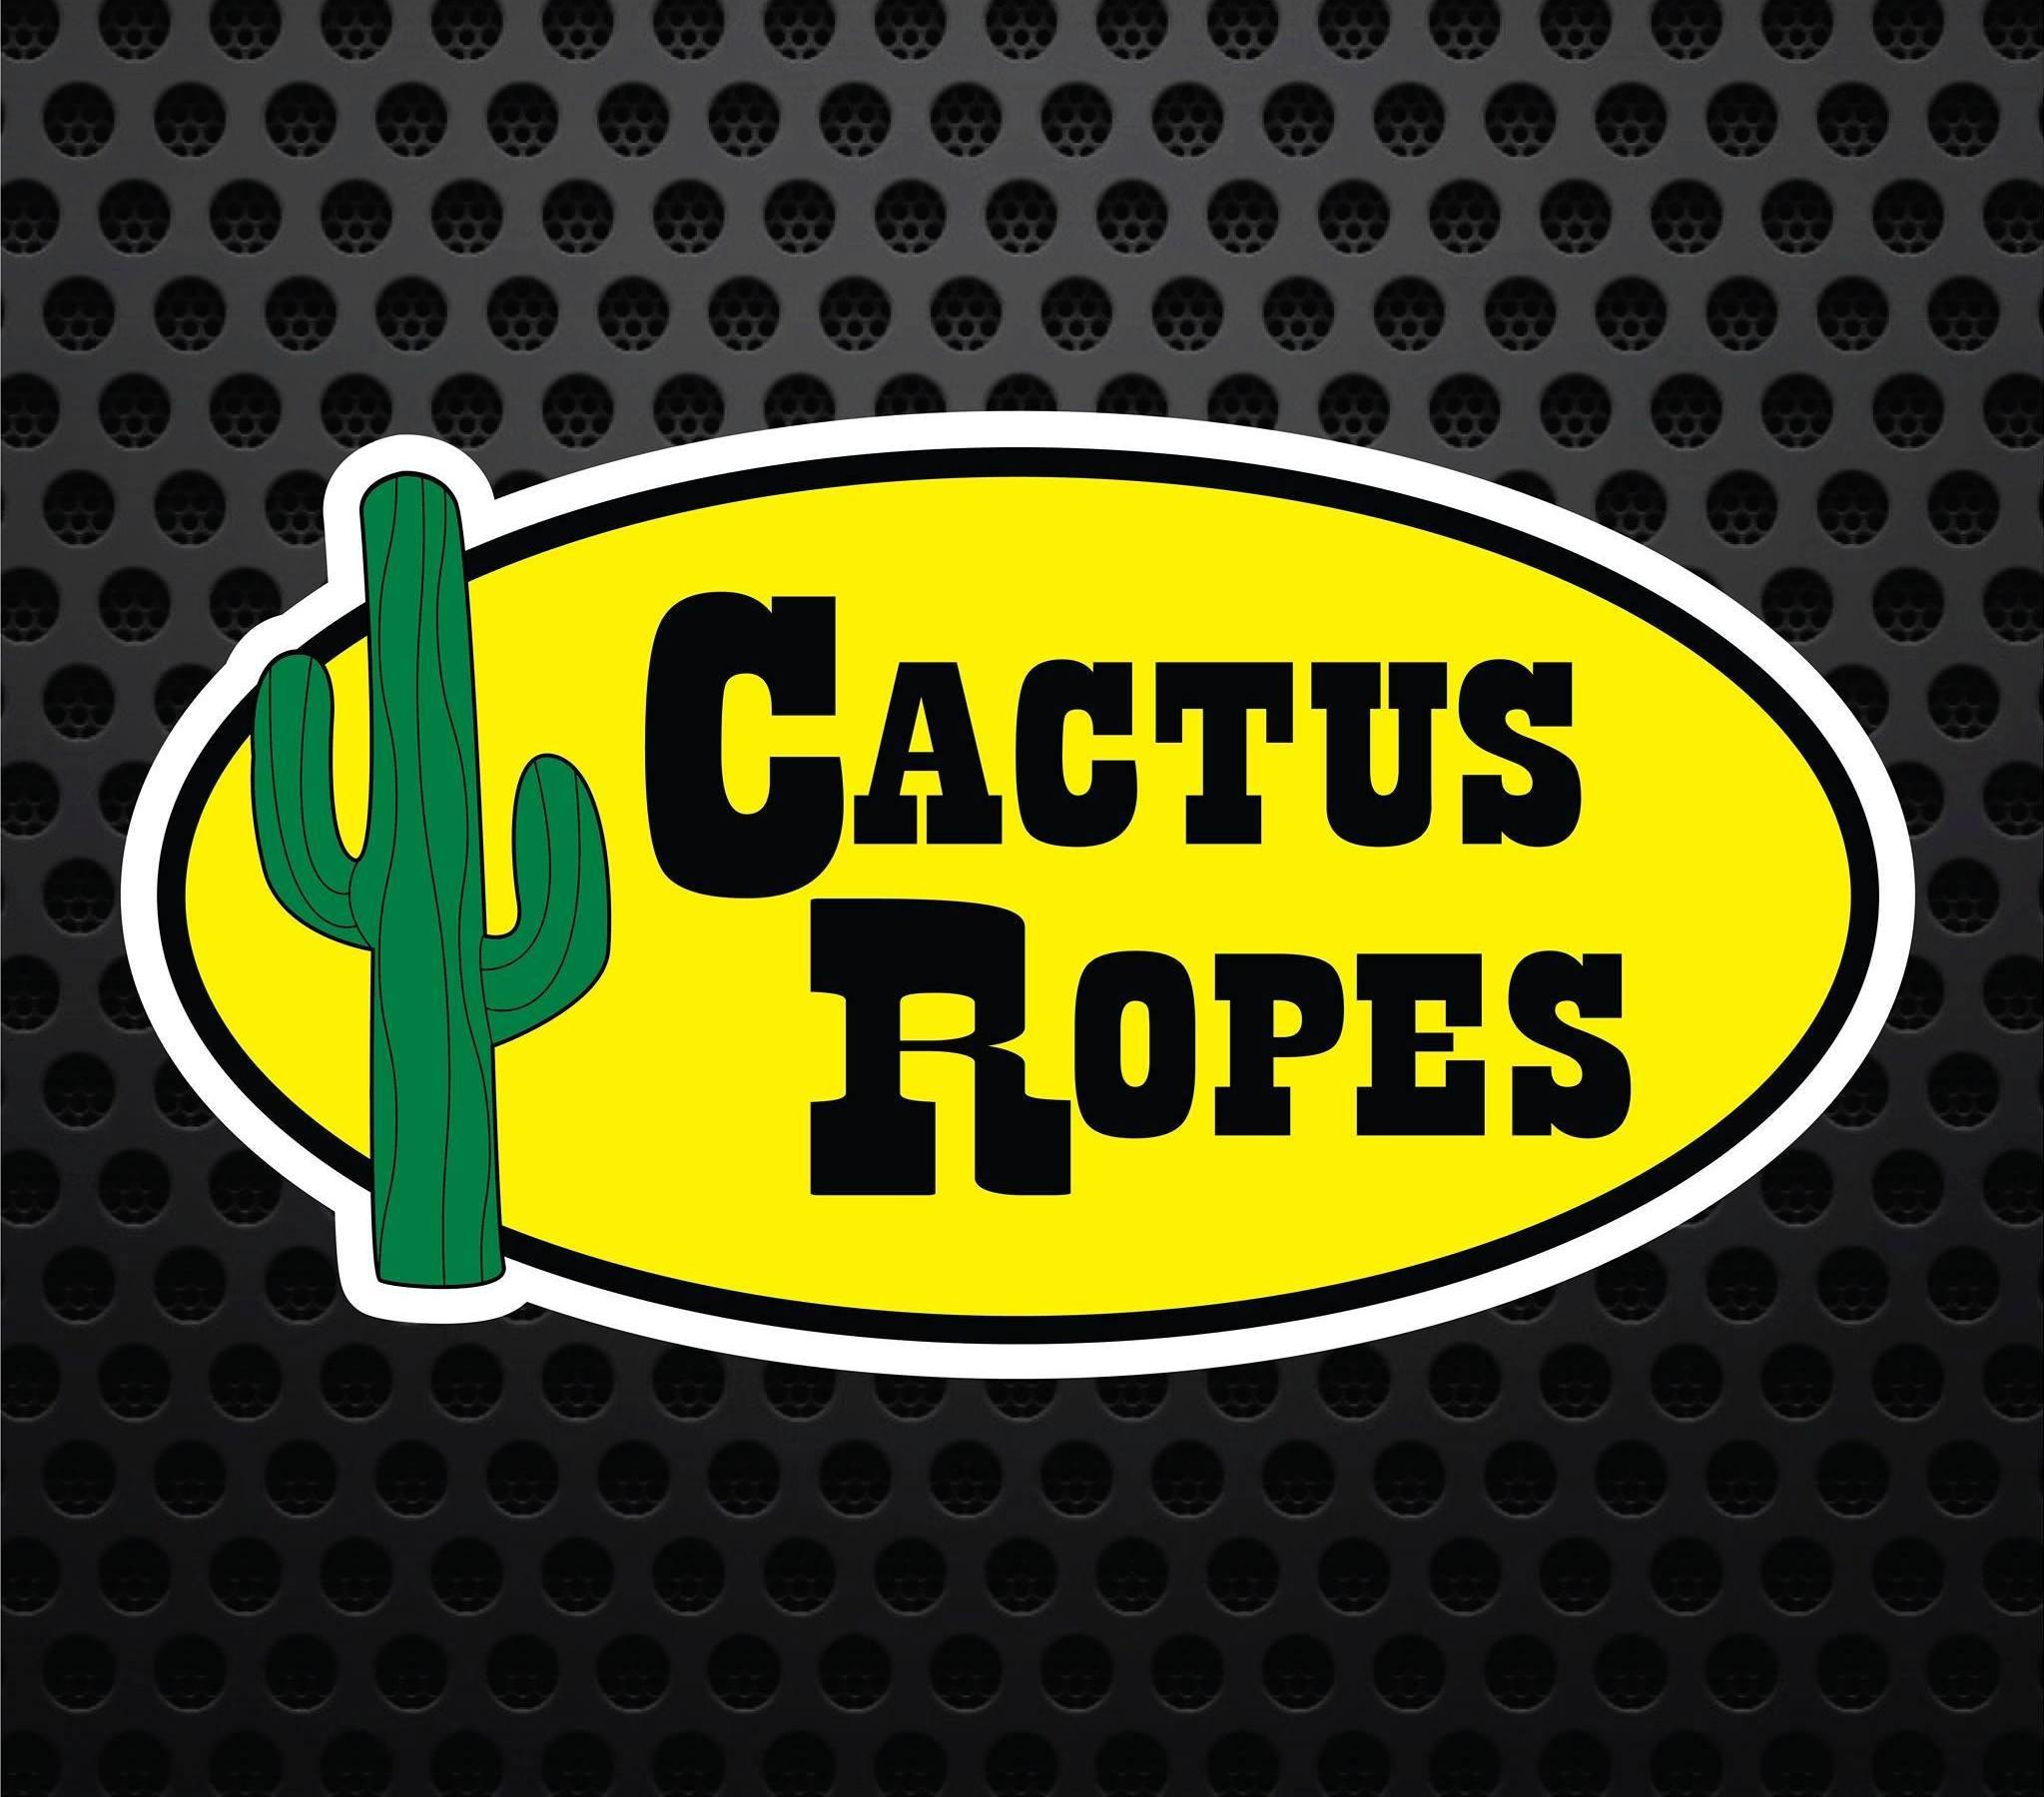 Cactus Ropers